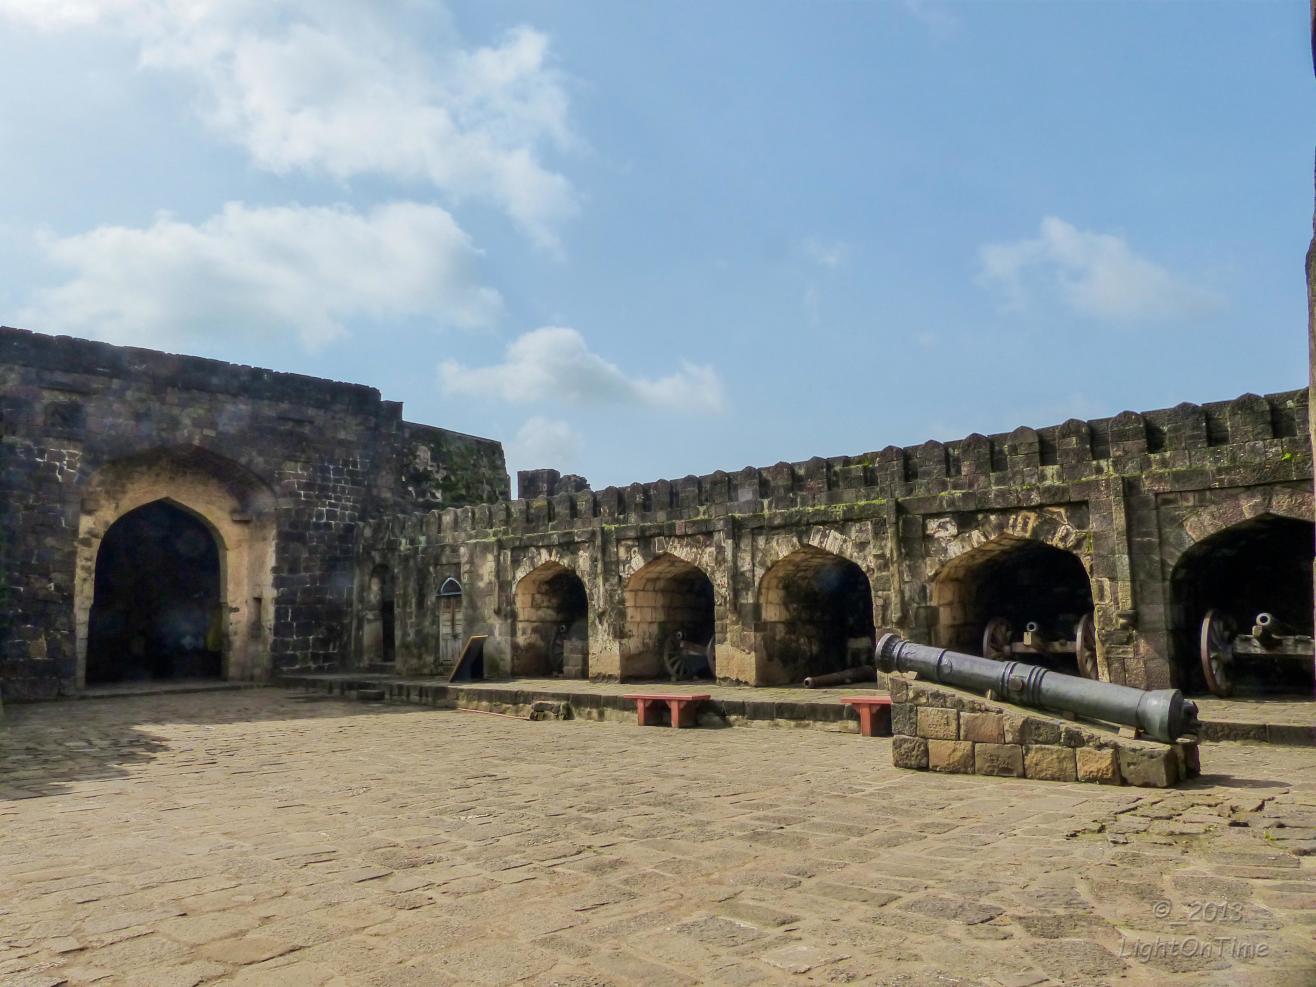 Daulatabad Fort (Devagiri or Deogiri Killa), Aurangabad